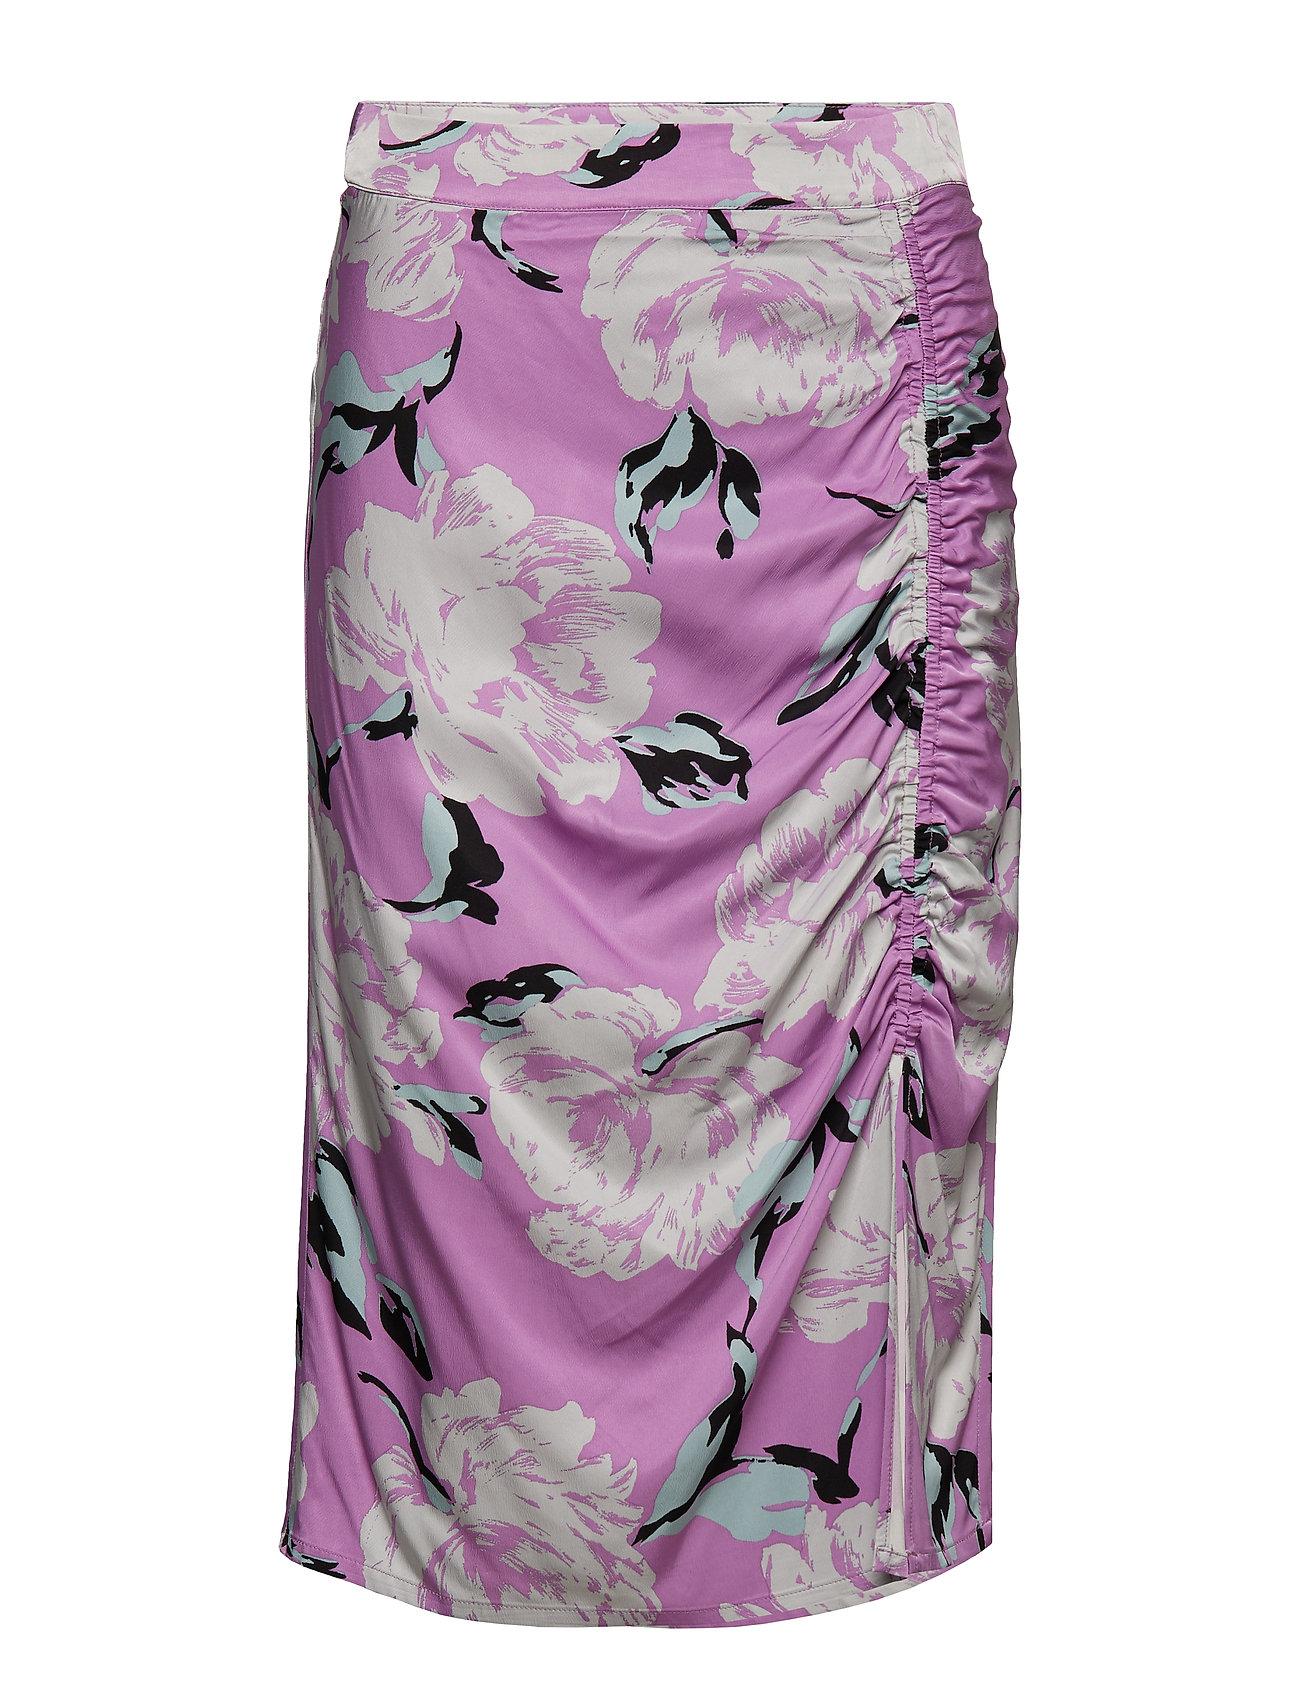 Gestuz Gwin skirt MS19 - PURPLE FLOWER